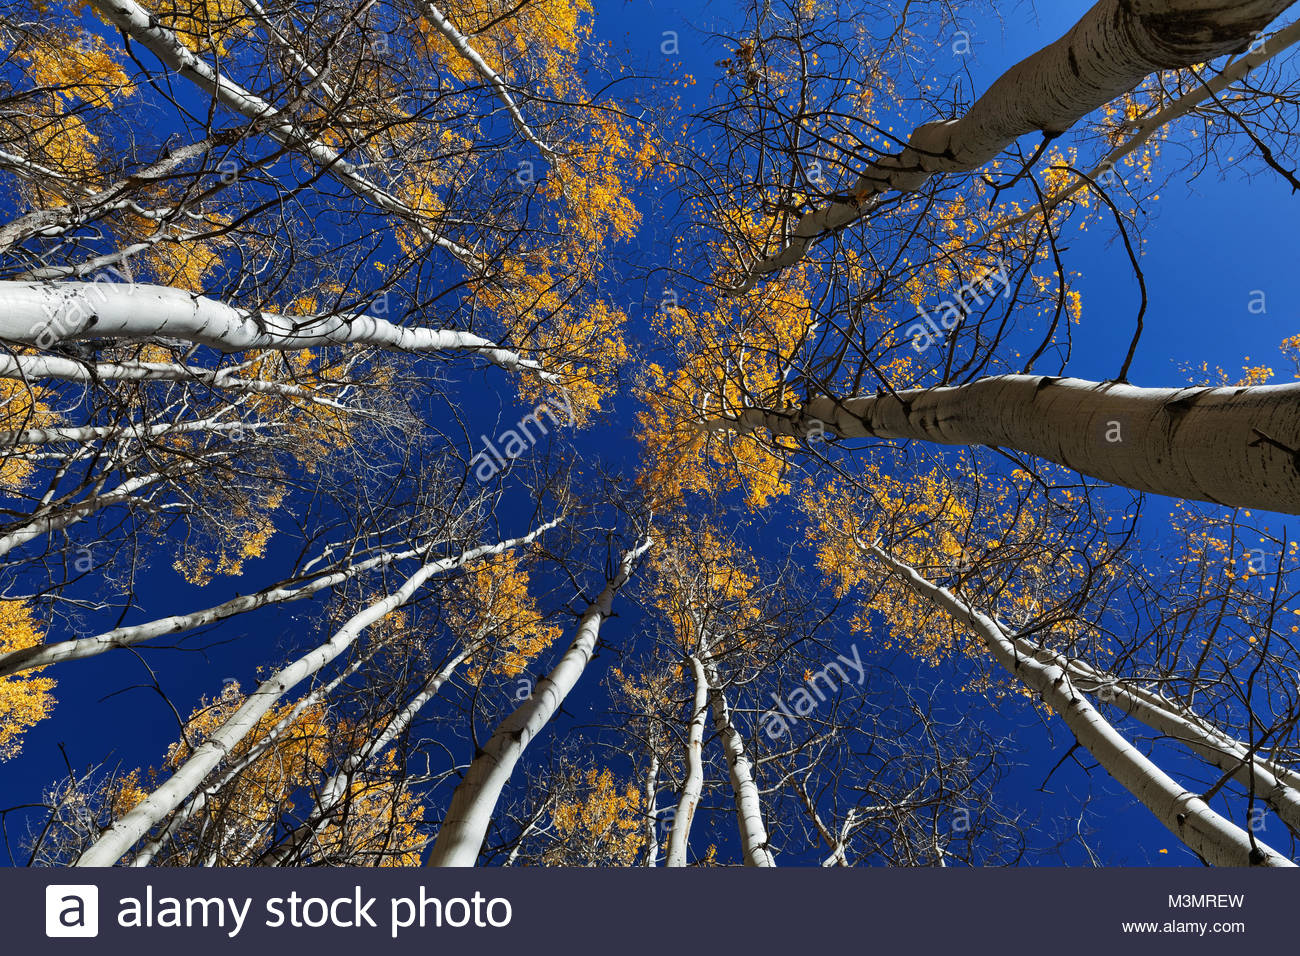 Aspen trees in Colorado - Stock Image